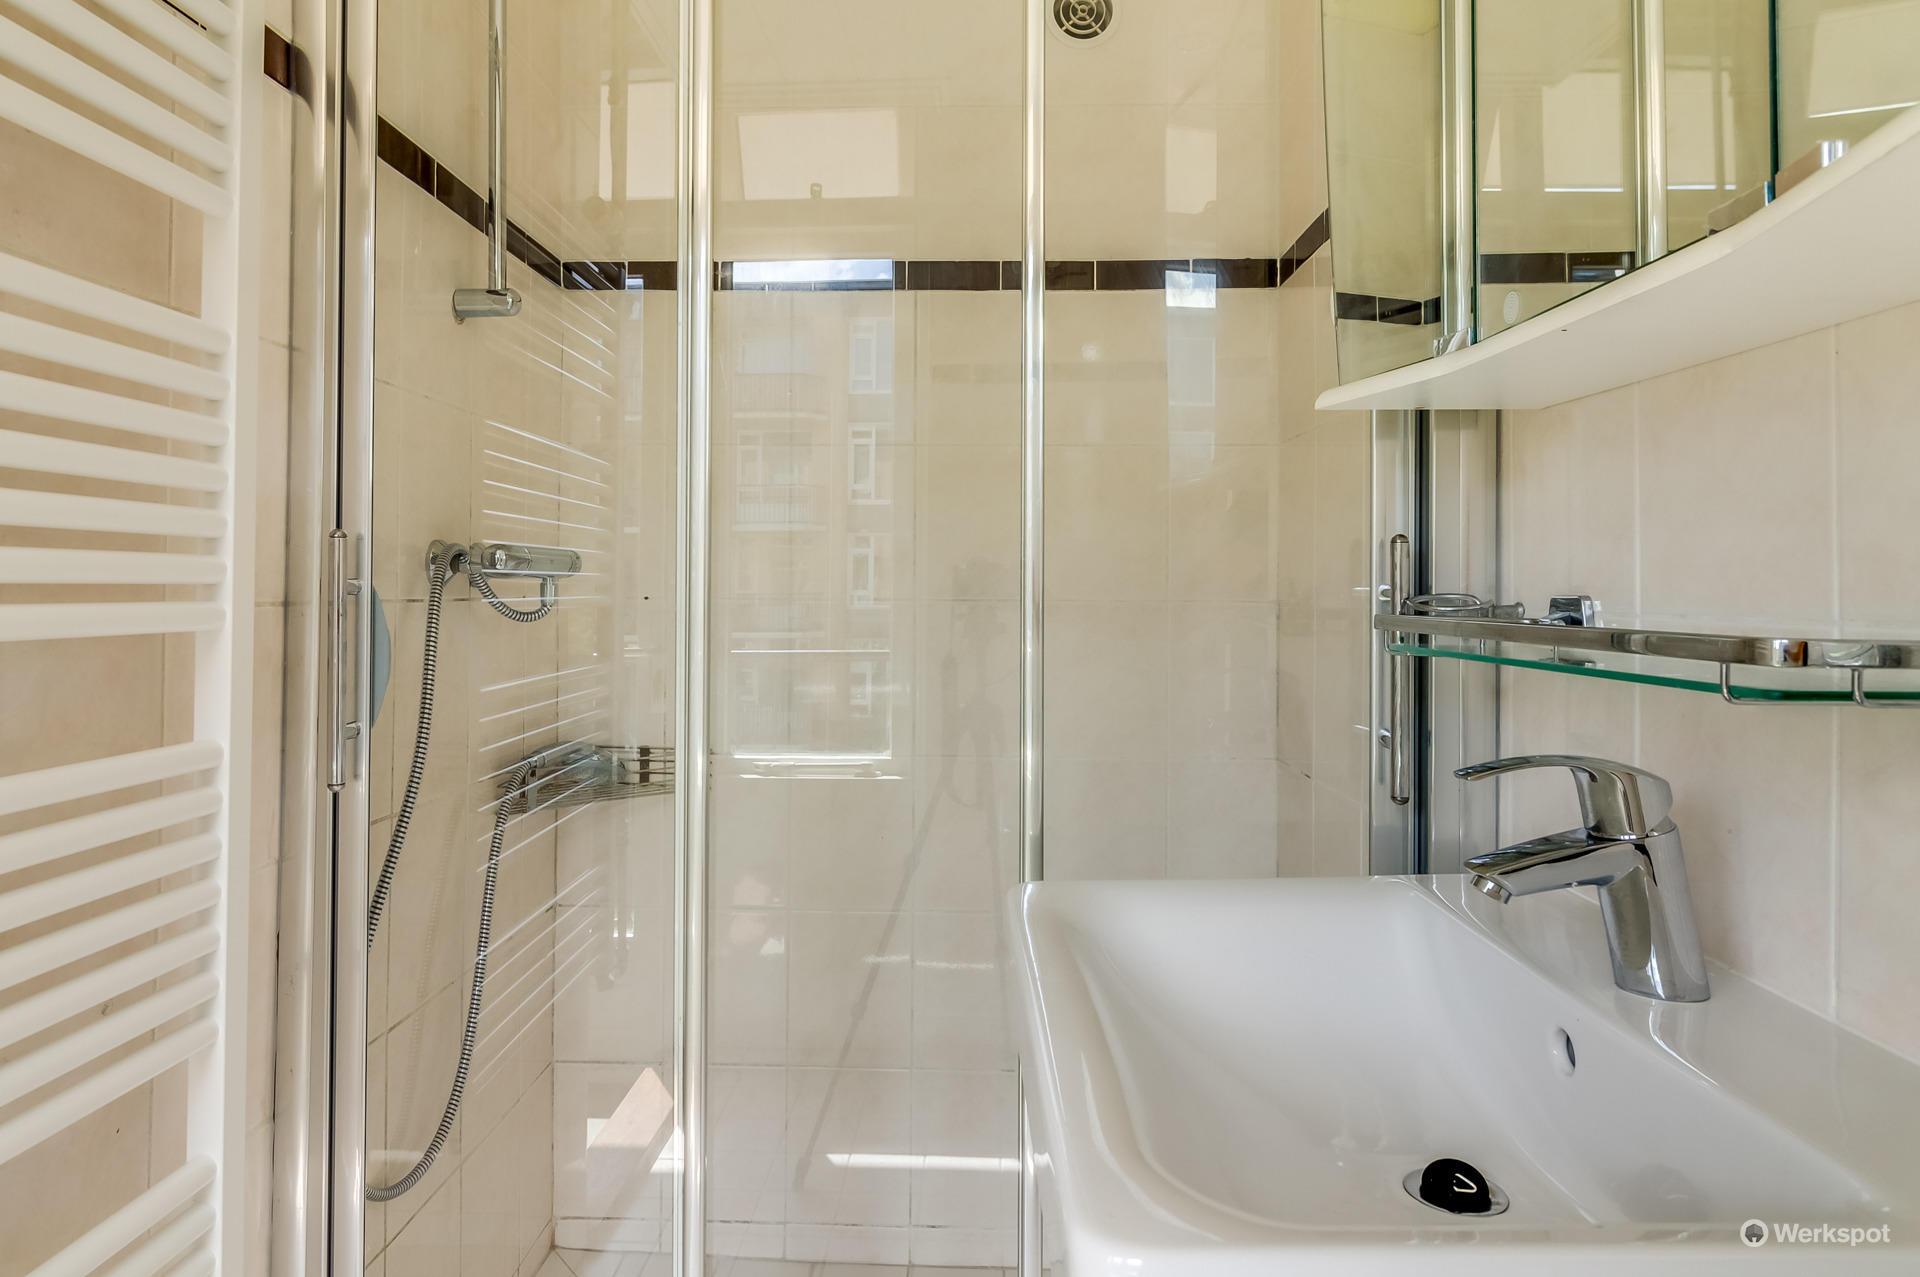 Badkamer Douche Kranen : Wasbak en kraan in badkamer vervangen douchekranen vervangen